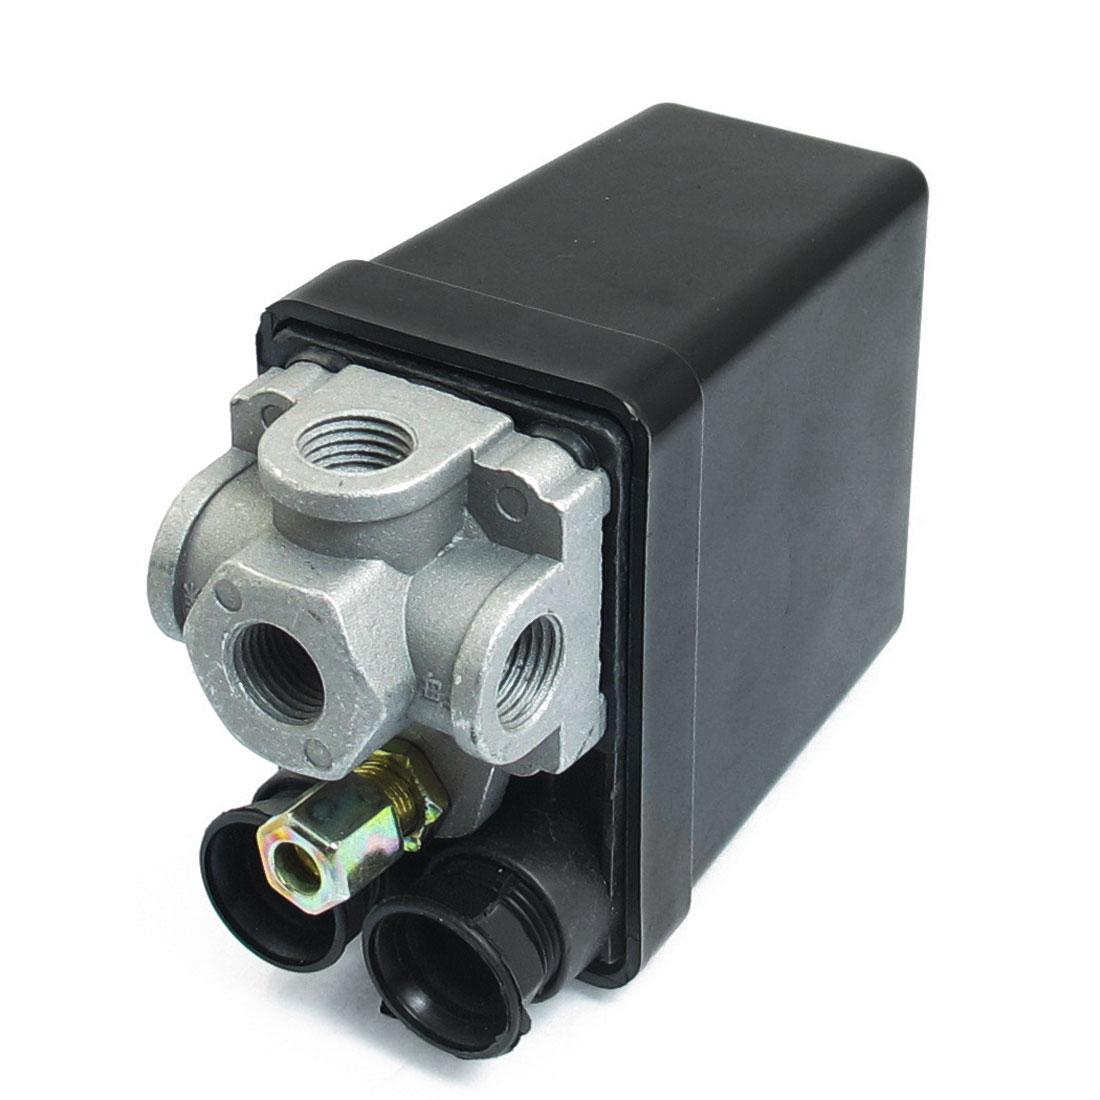 AC 240V 20A 4 Port 175 PSI 12 Bar Air Compressor Pump Pressure Switch Control Valve